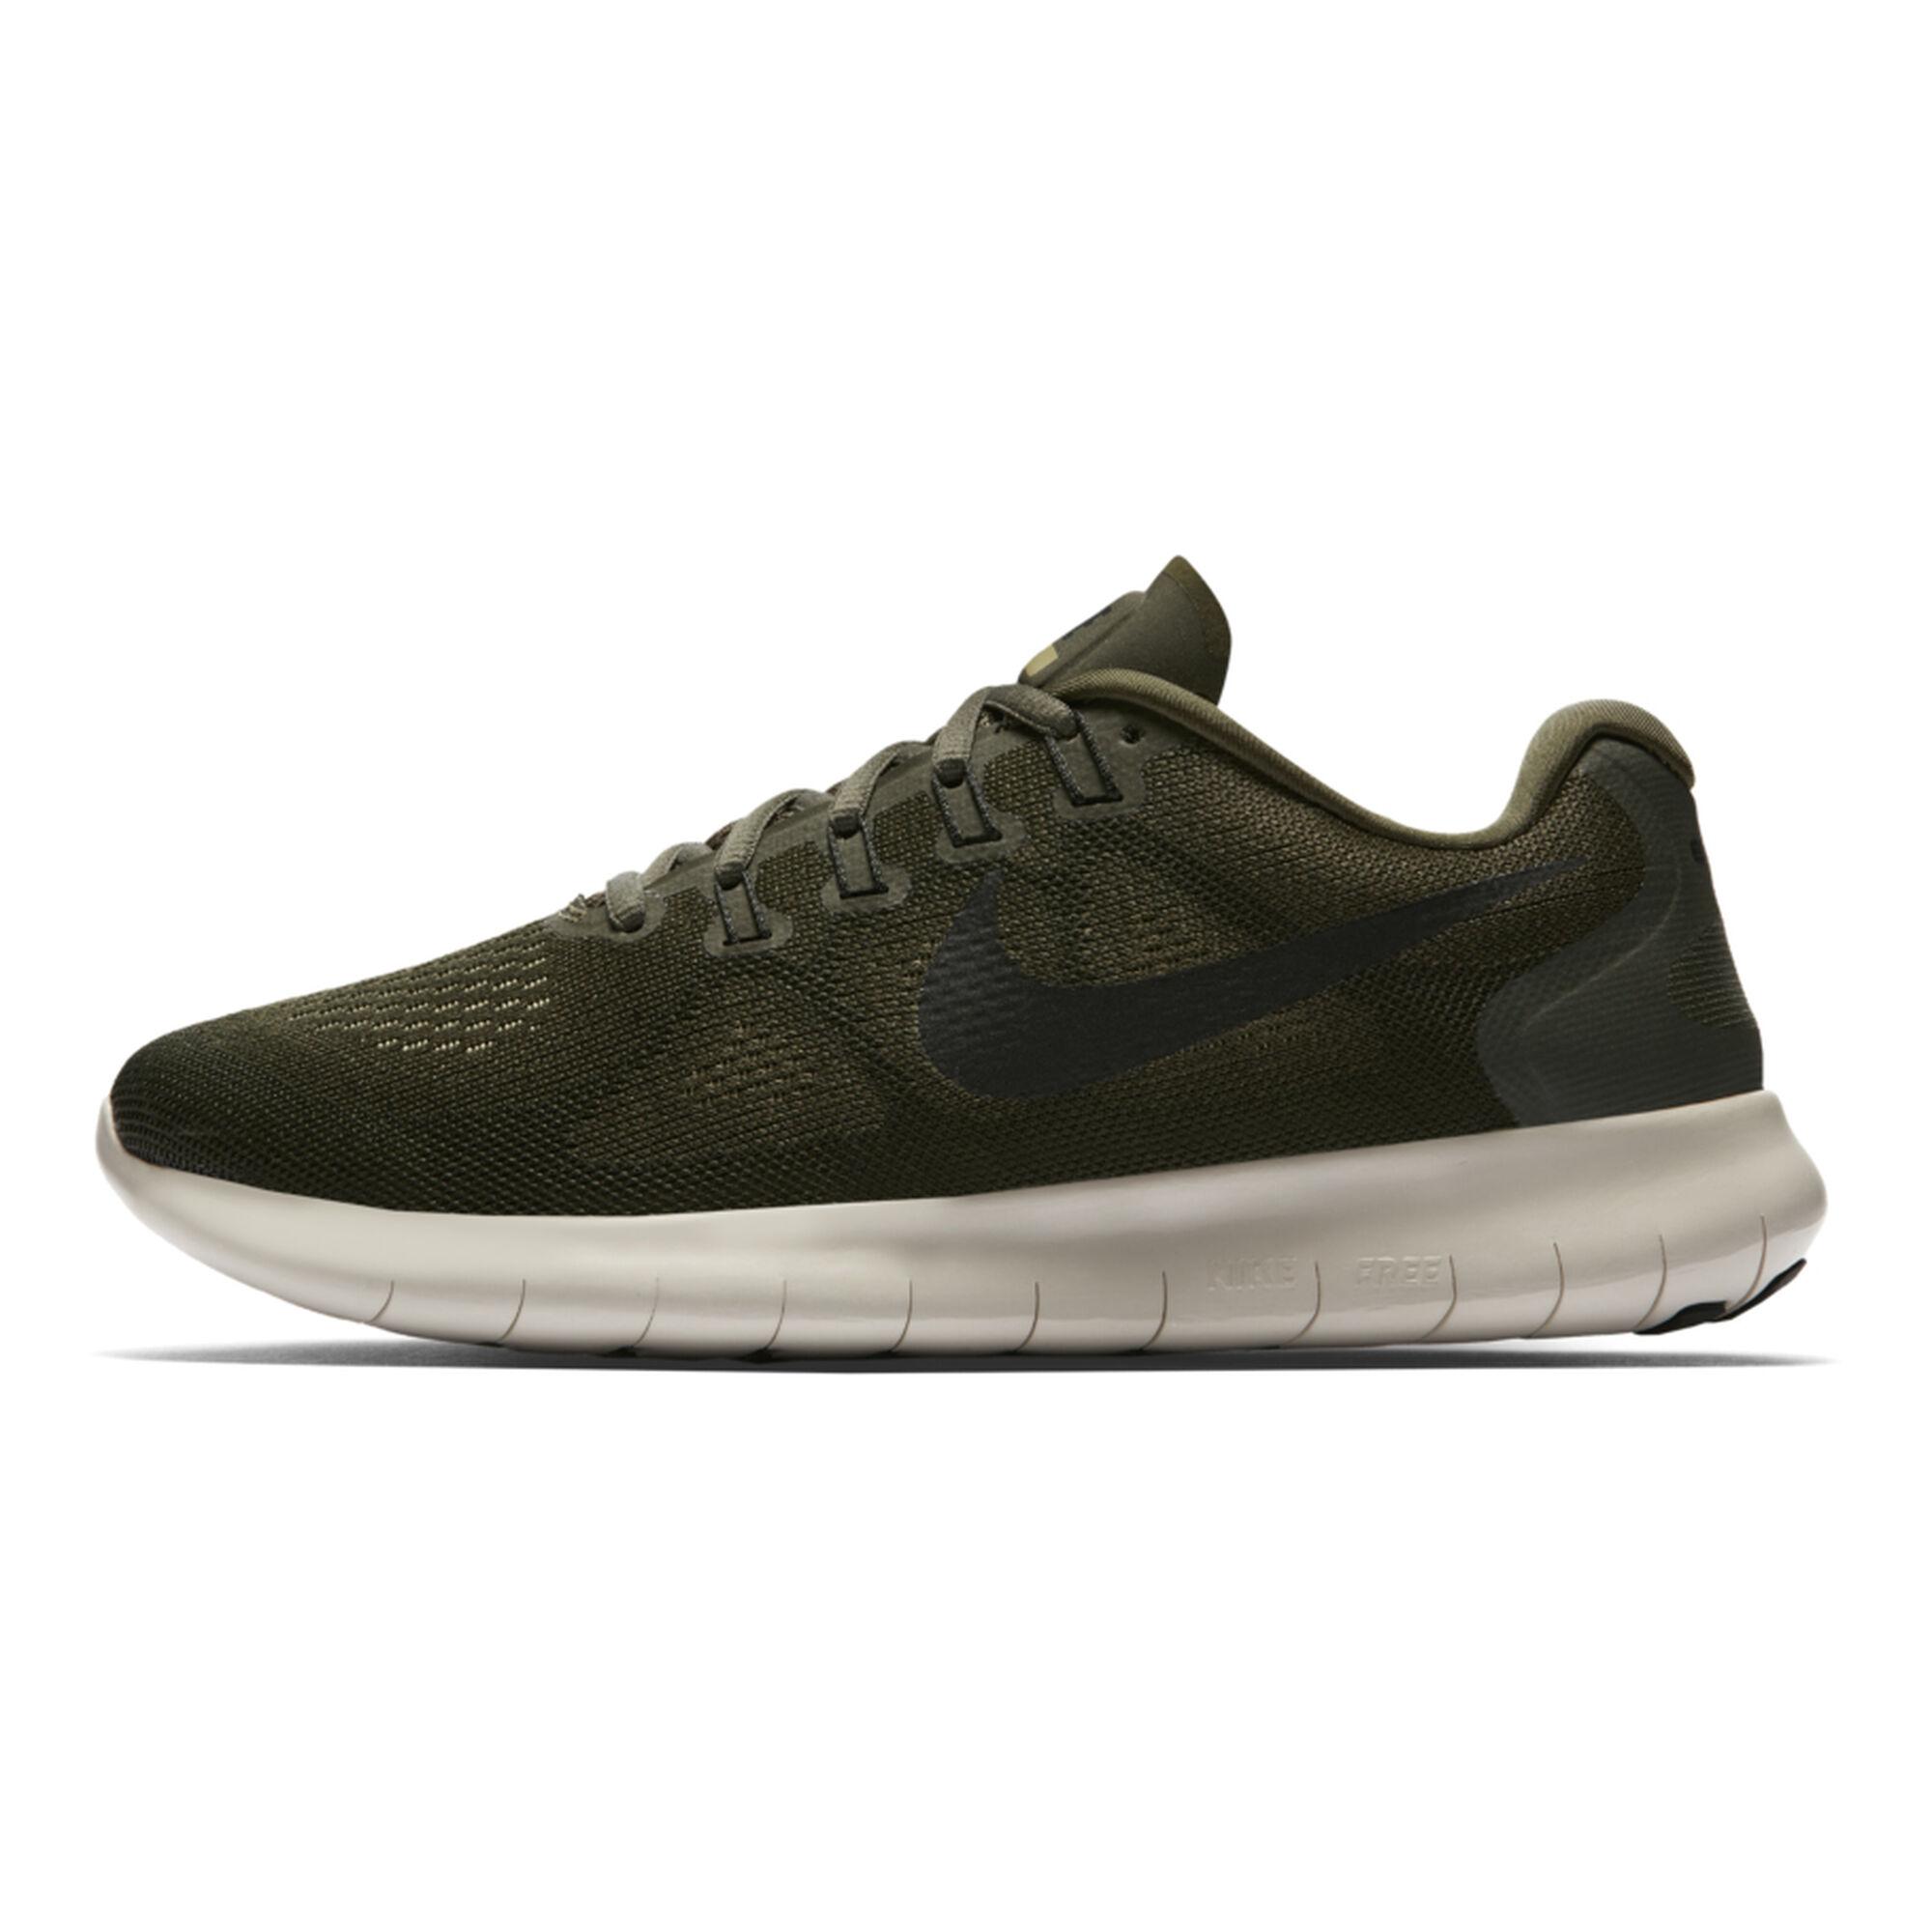 89f5cb687f27 buy Nike Free Run 2017 Natural Running Shoe Women - Khaki